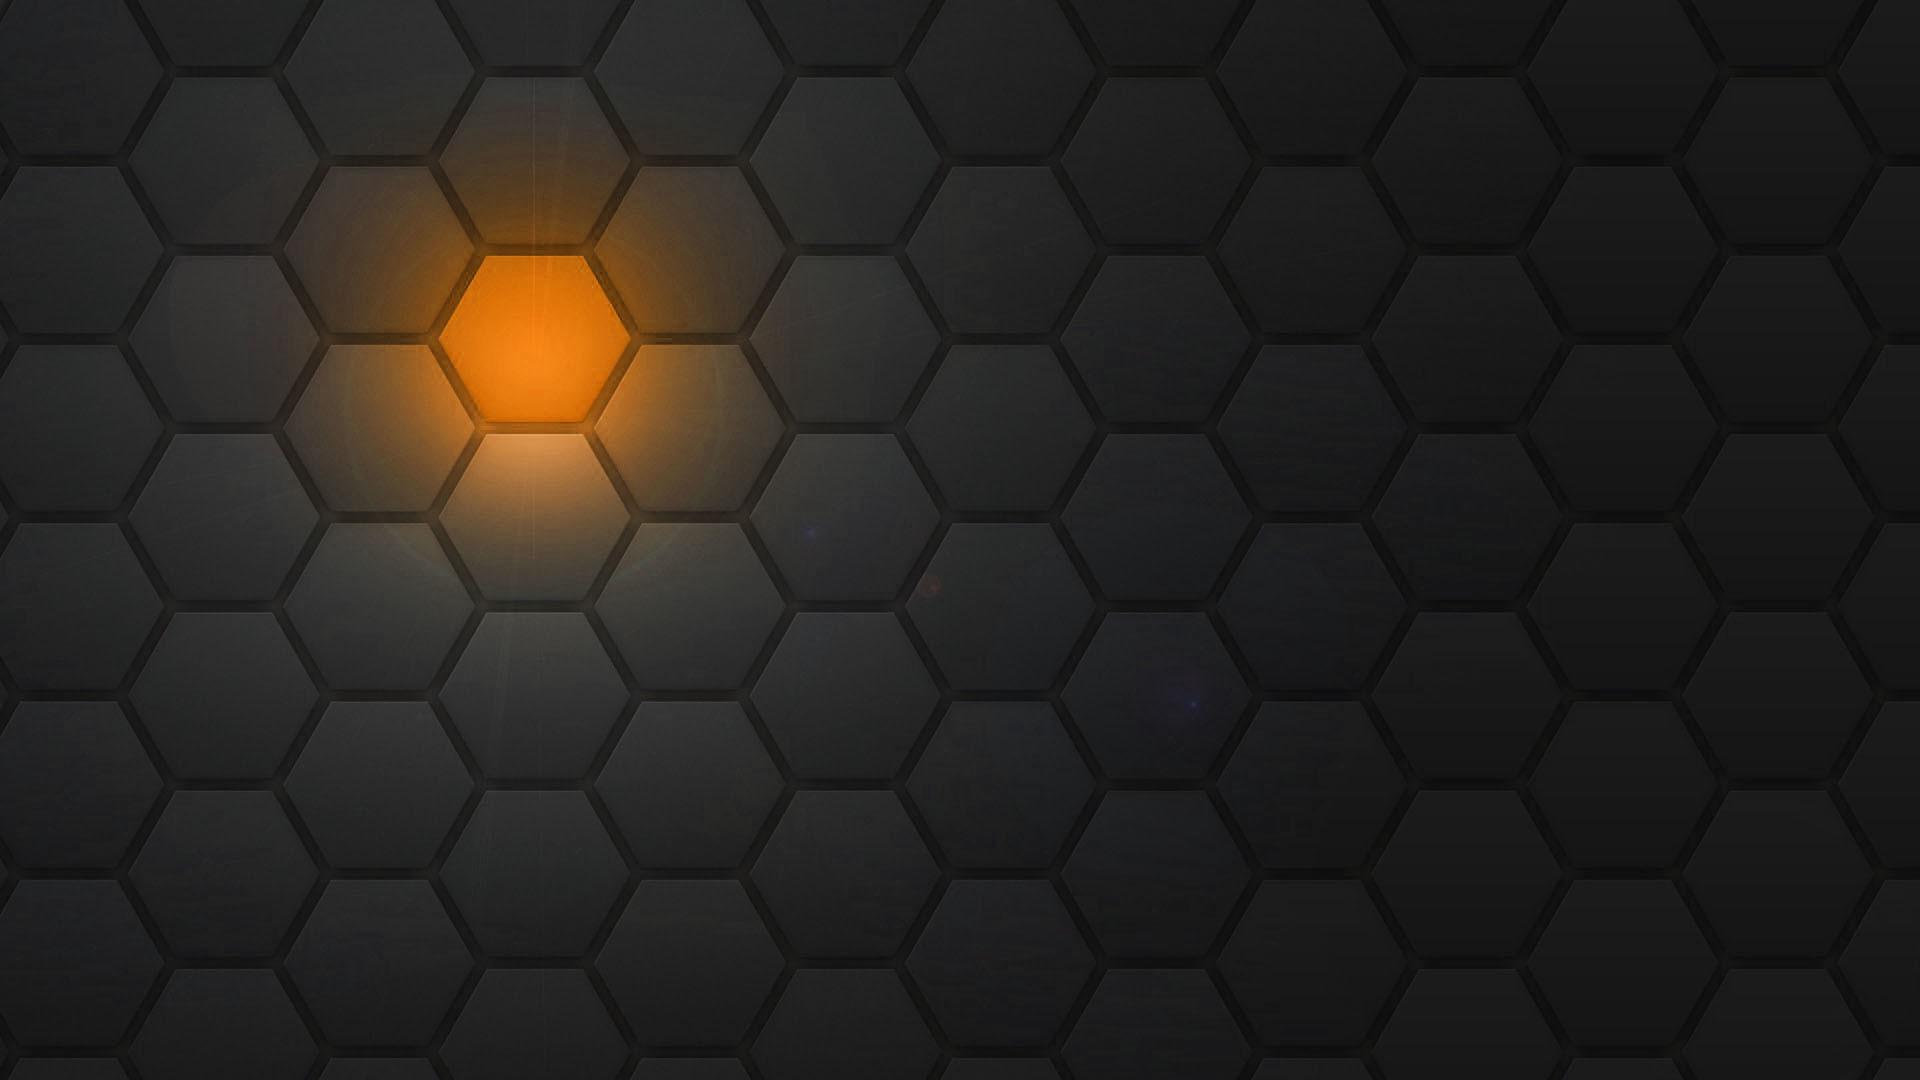 Black Orange Wallpaper (62 Wallpapers)